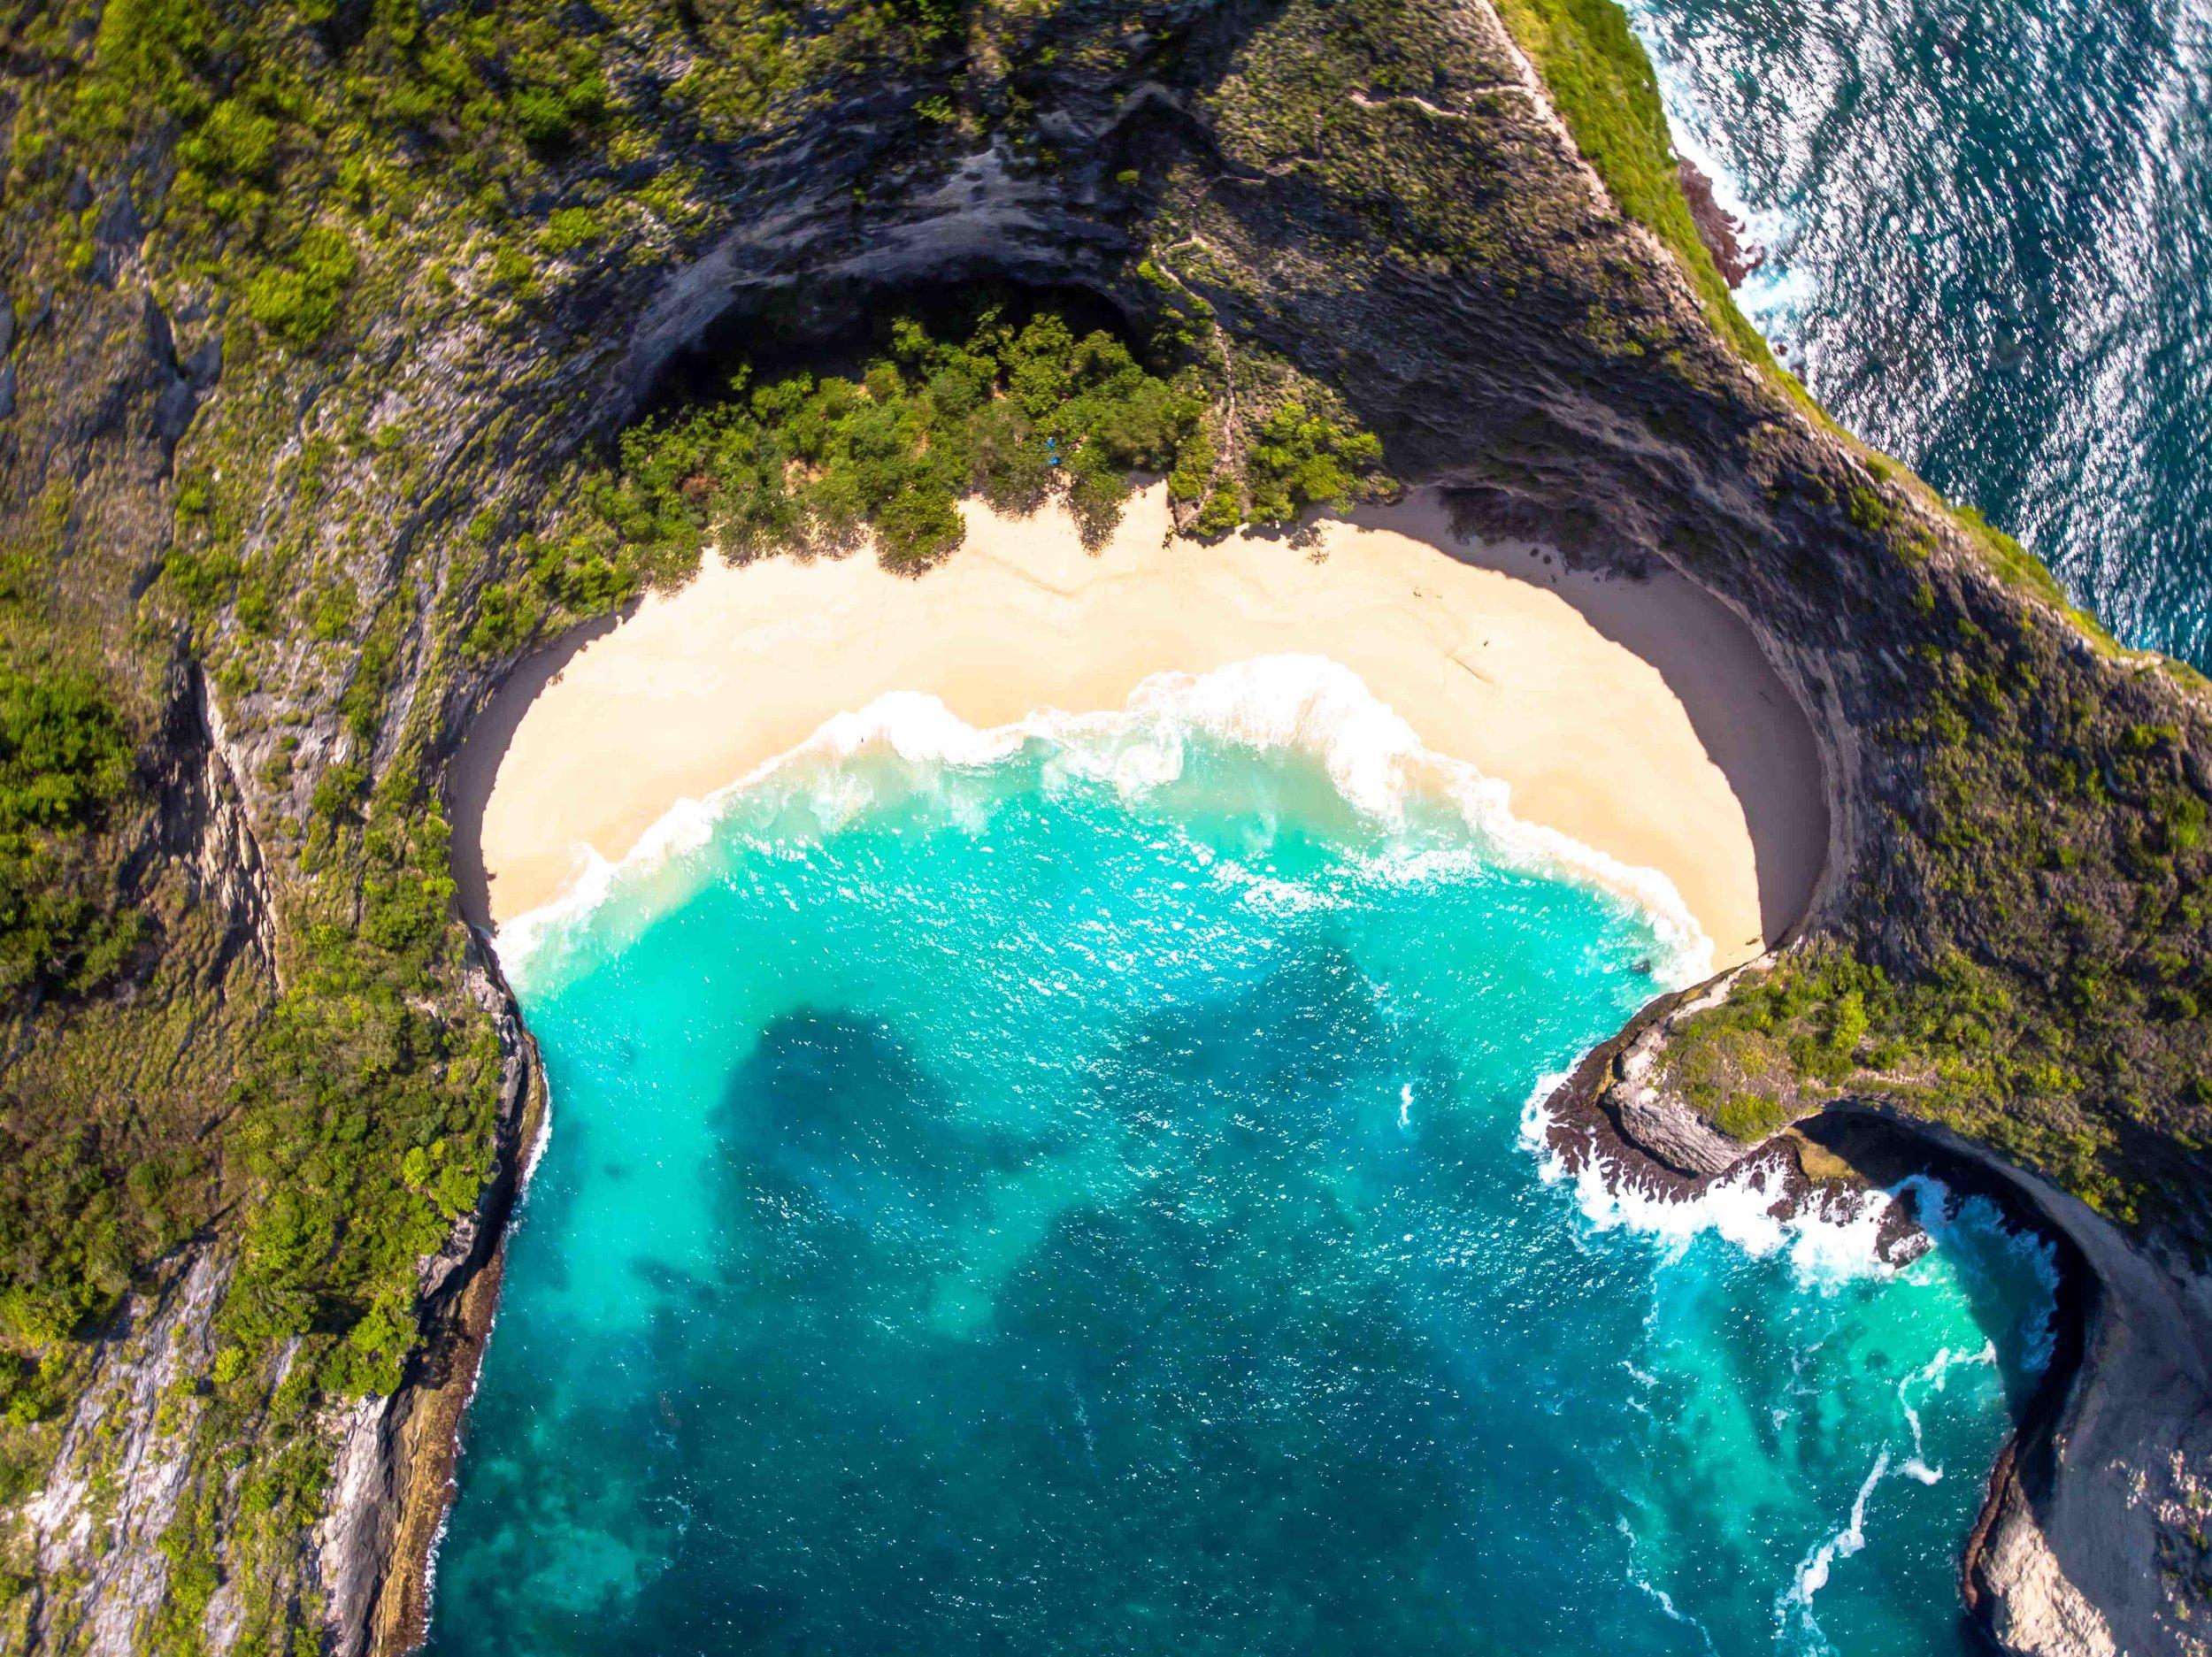 tropical_paradise_beach_island_bali_indonesia_nusa penida_kelingking.jpg